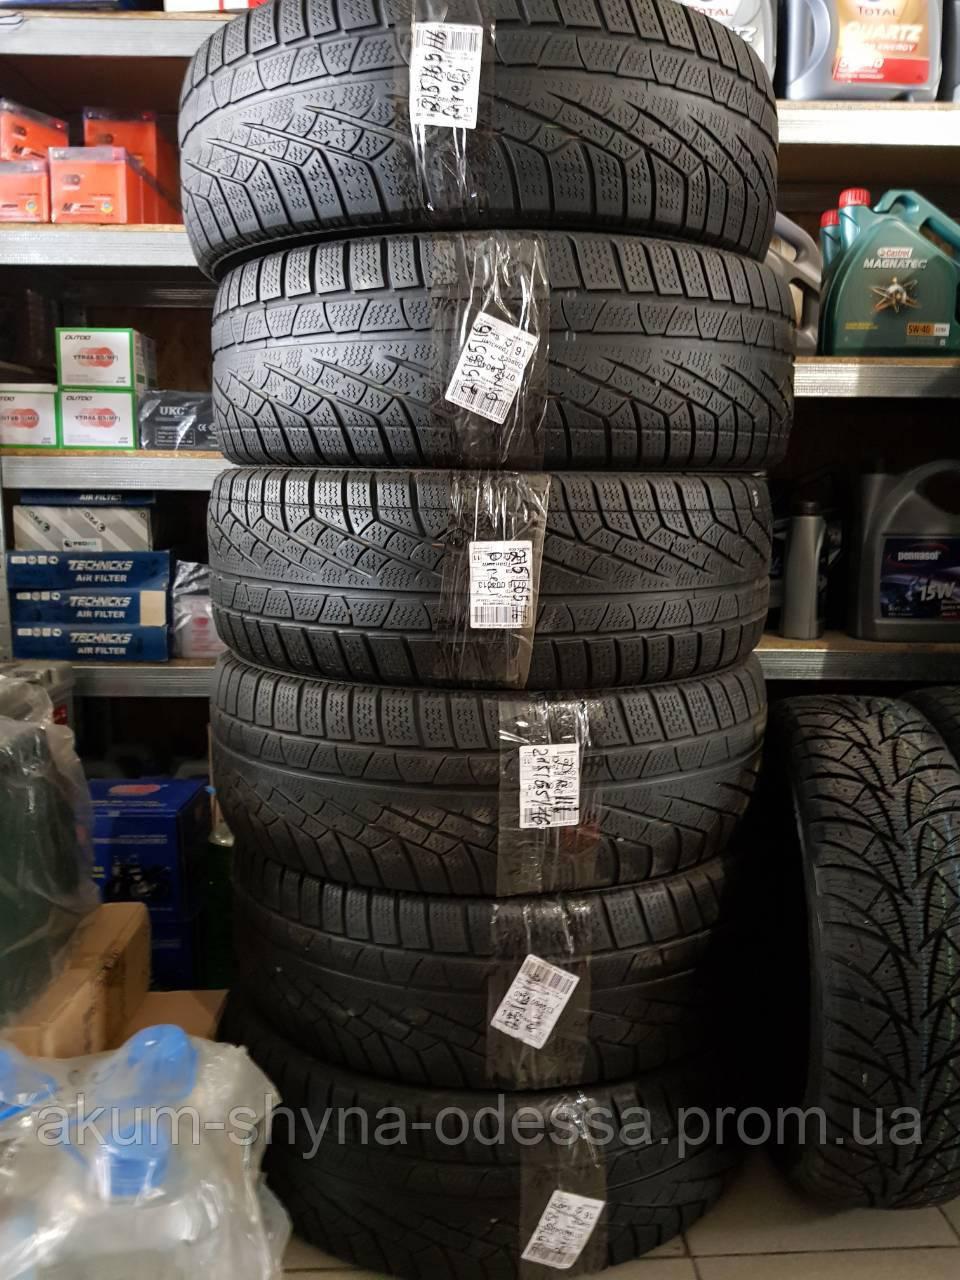 Шины зимние б/у 215/65 R16 Pirelli 2шт, 6мм протектор, успех